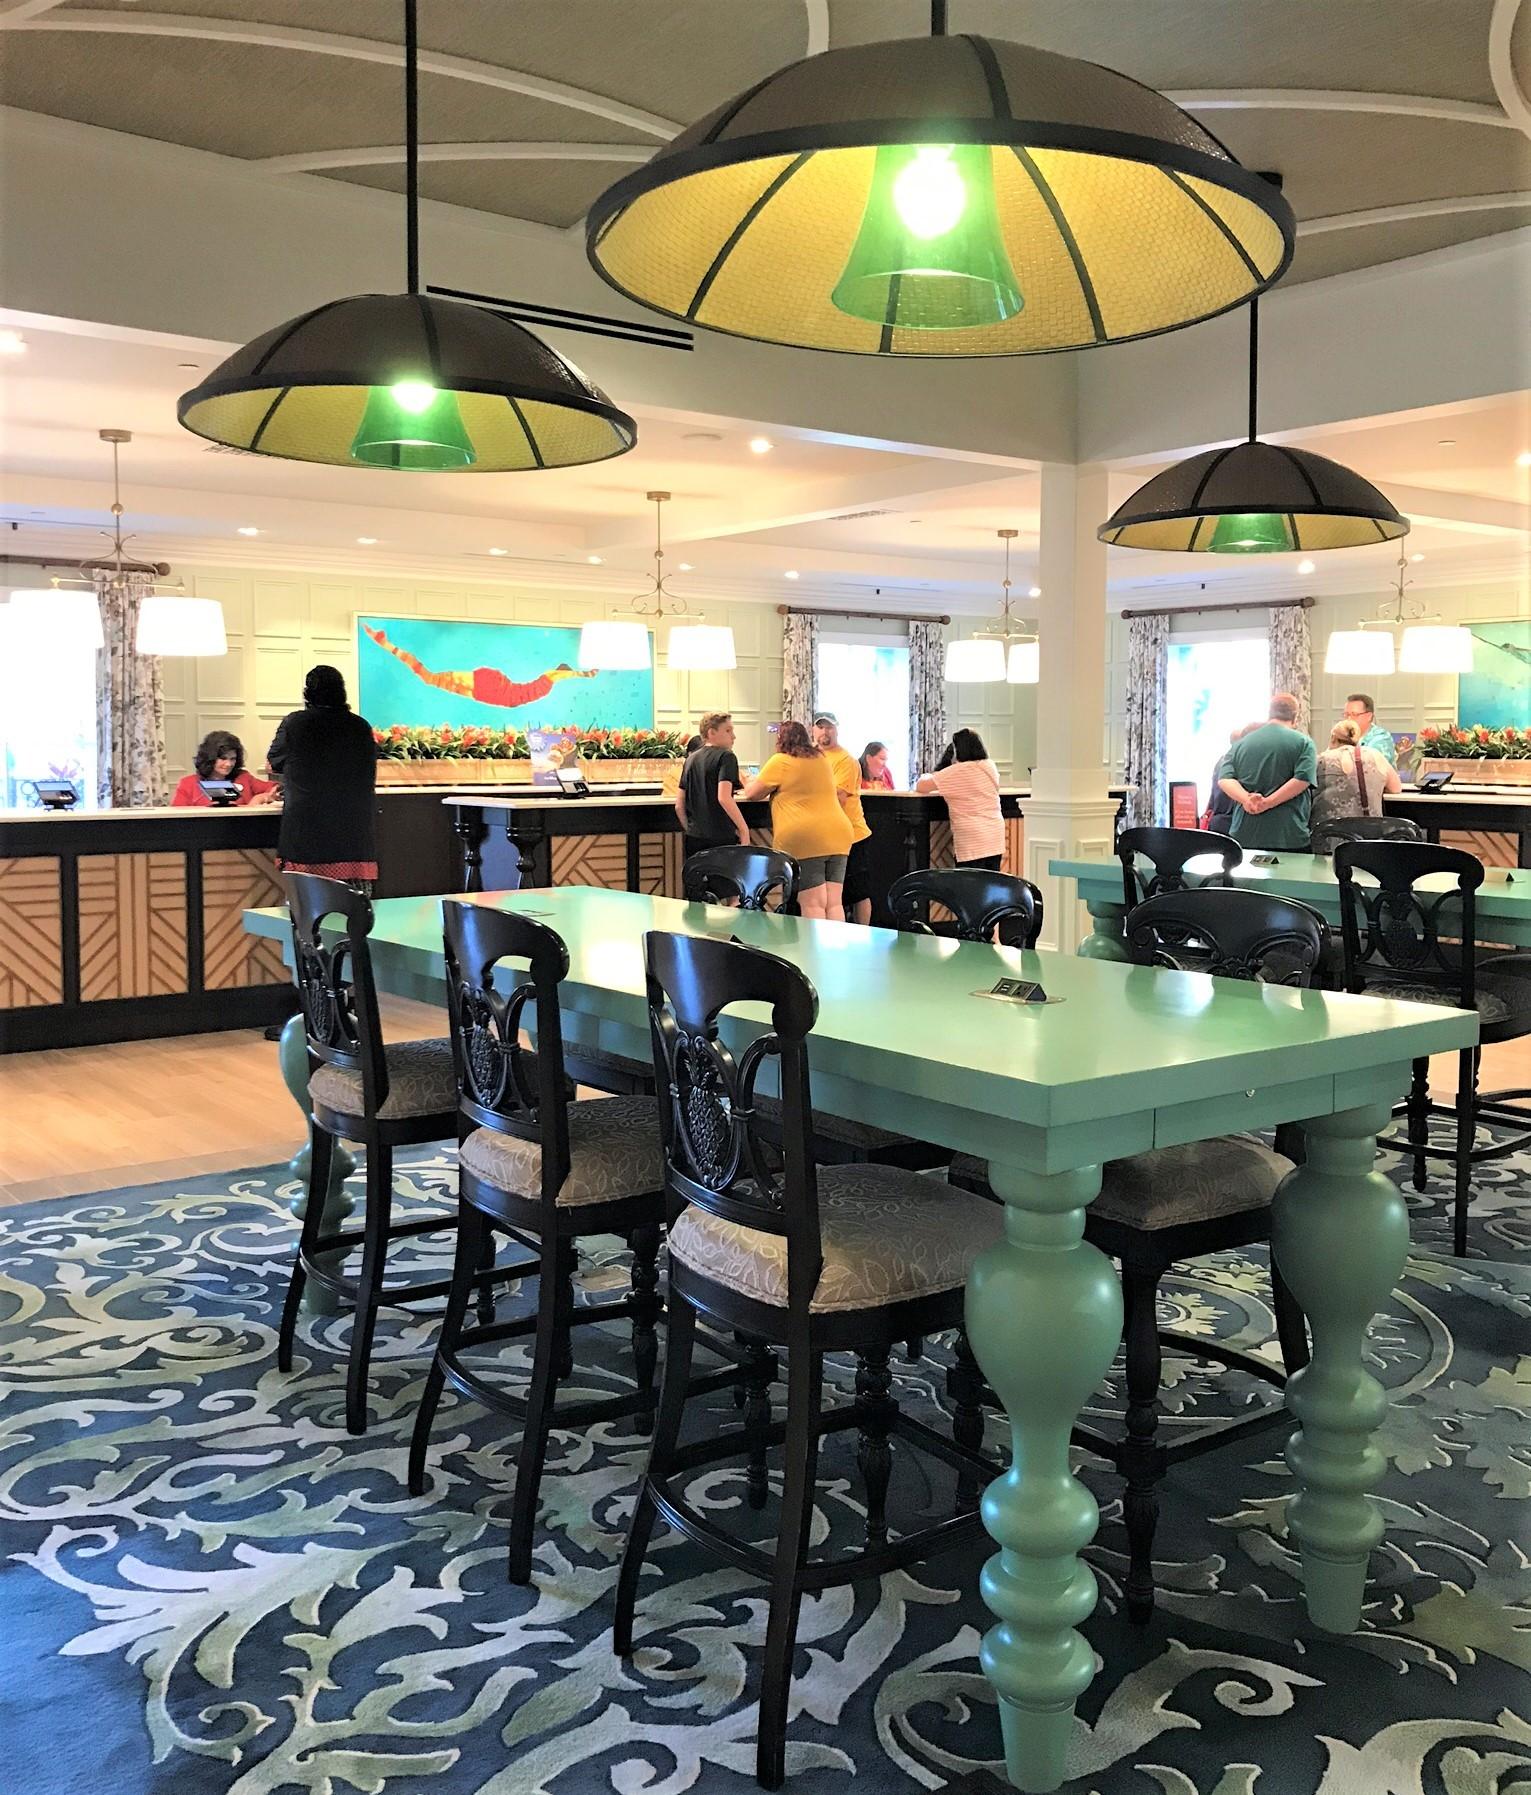 caribbean beach resort new check-in desk